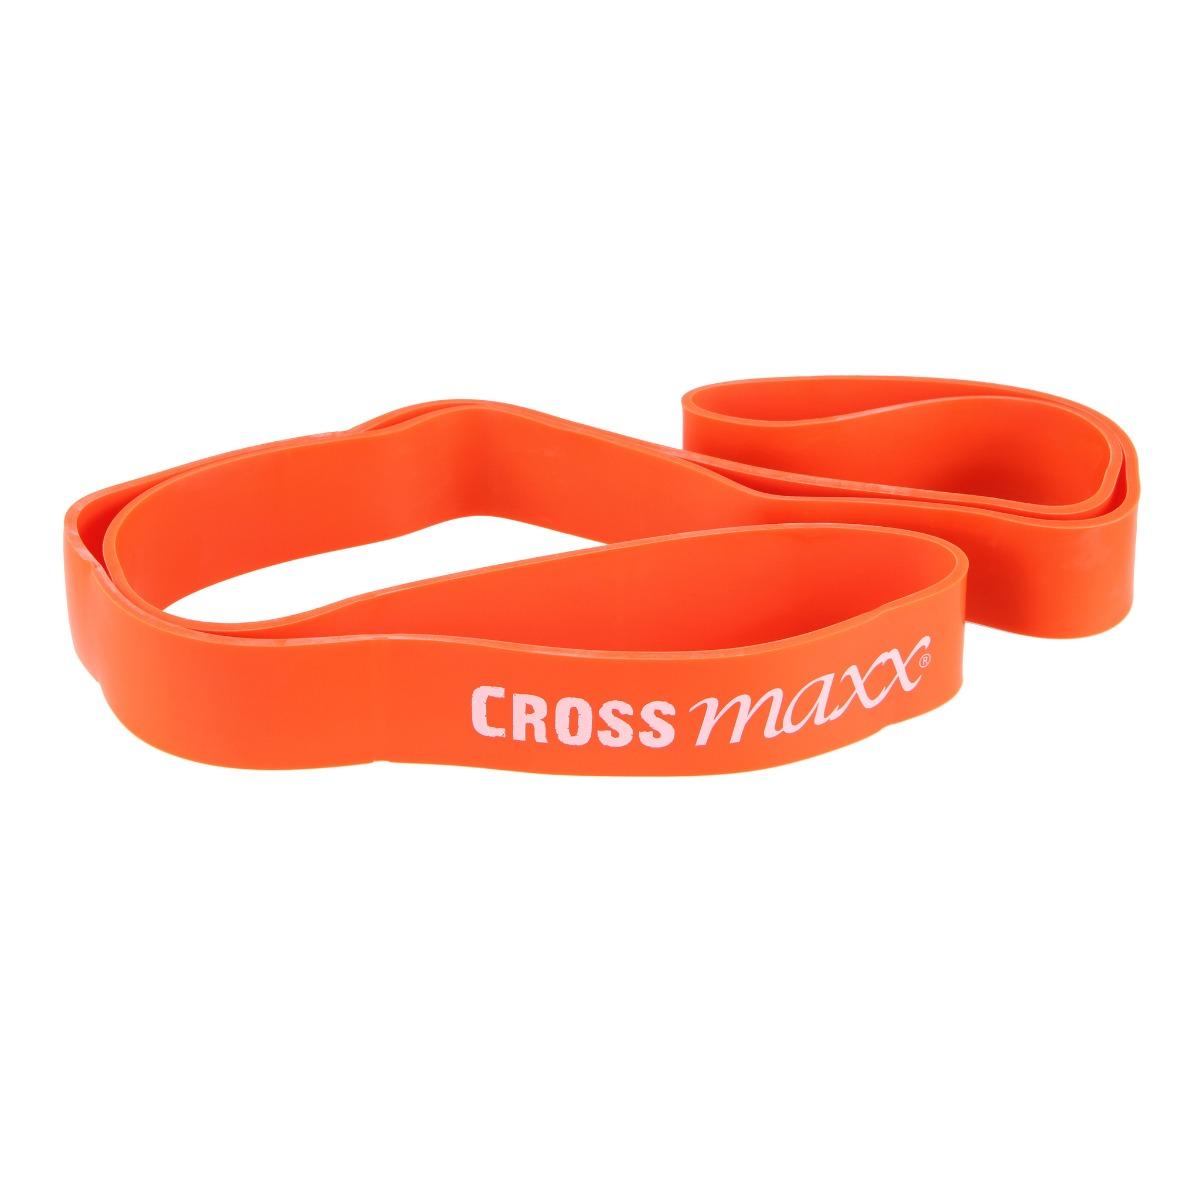 LMX Crossmaxx Weerstandsband 104 cm – Niveau 3 – Oranje – jokasport.nl